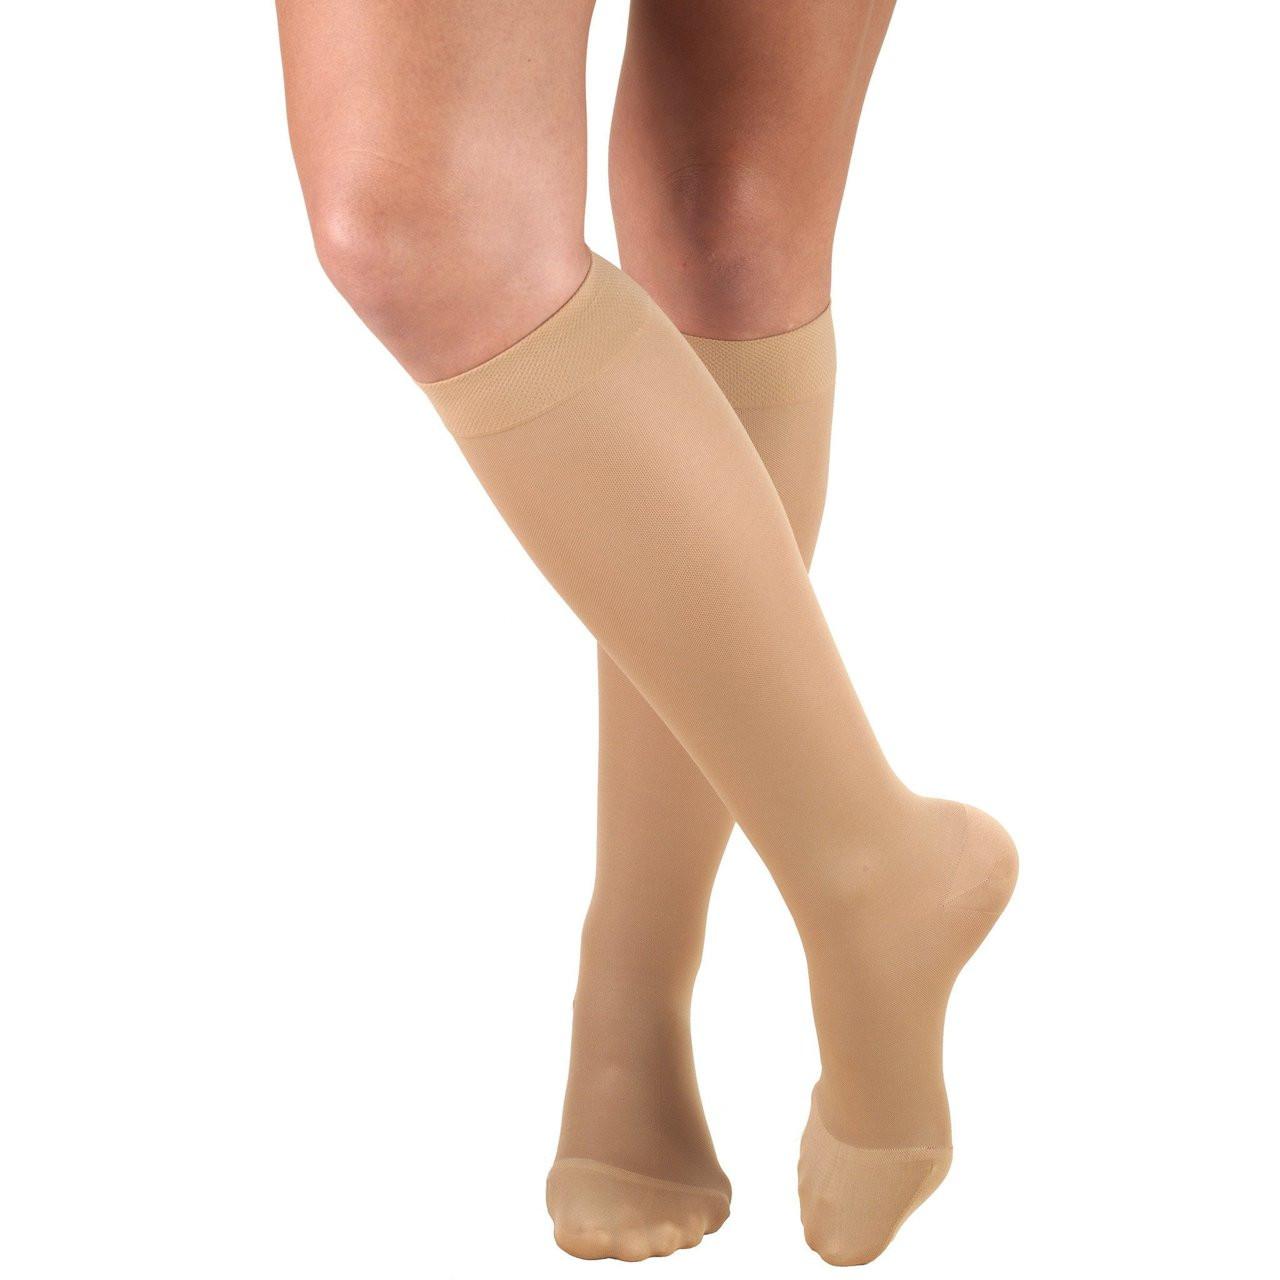 0a95d869385d6 Truform Opaque - Knee High 20-30mmHg - Select Socks Inc.